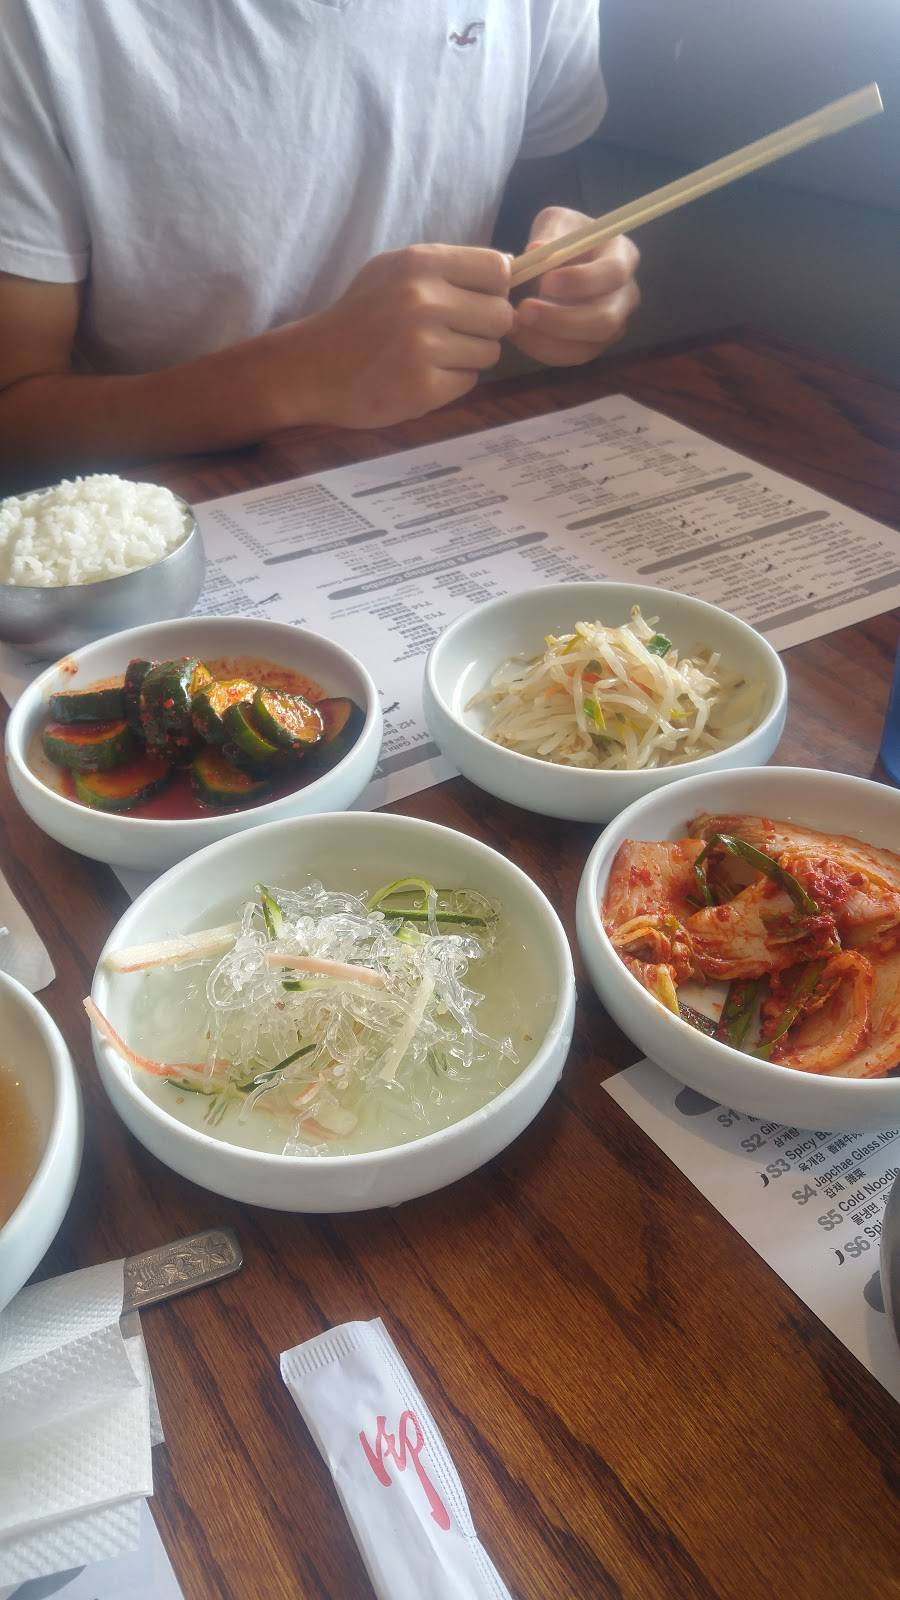 Myung Dong Tofu House | restaurant | 1025 S Glendora Ave, West Covina, CA 91790, USA | 6263380414 OR +1 626-338-0414